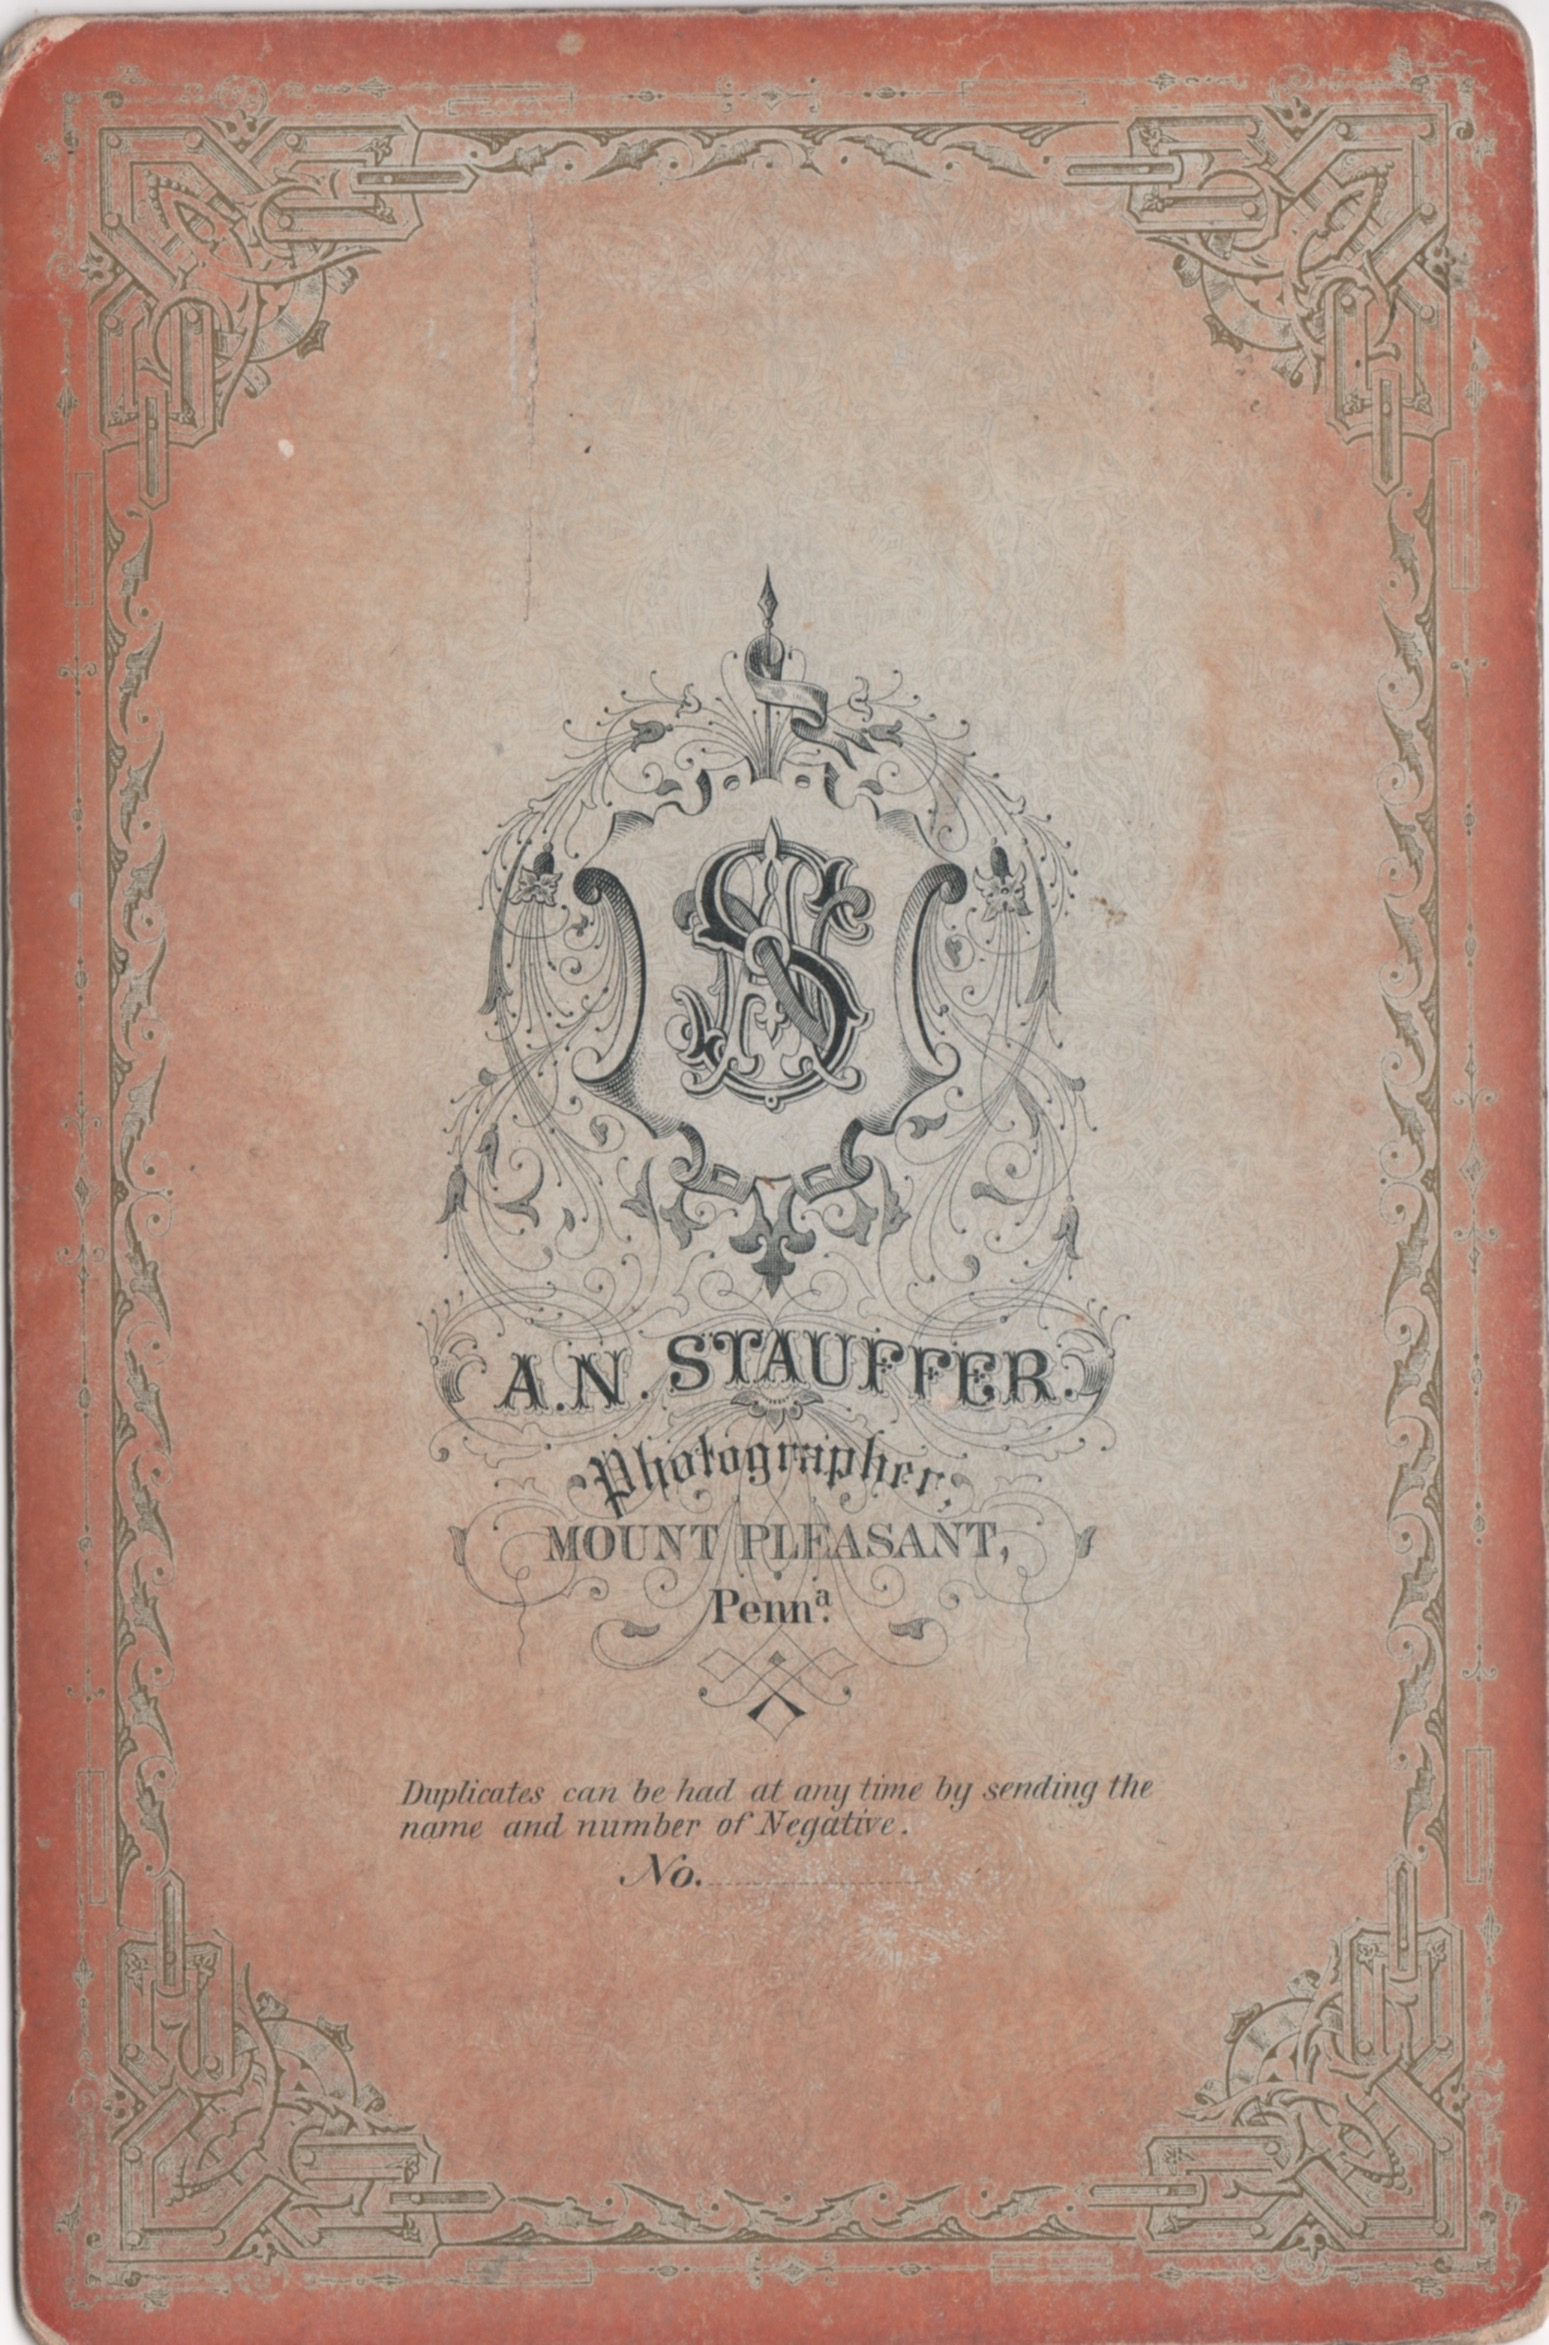 A.N. Stauffer - Photographer - Mount Pleasant, Penna